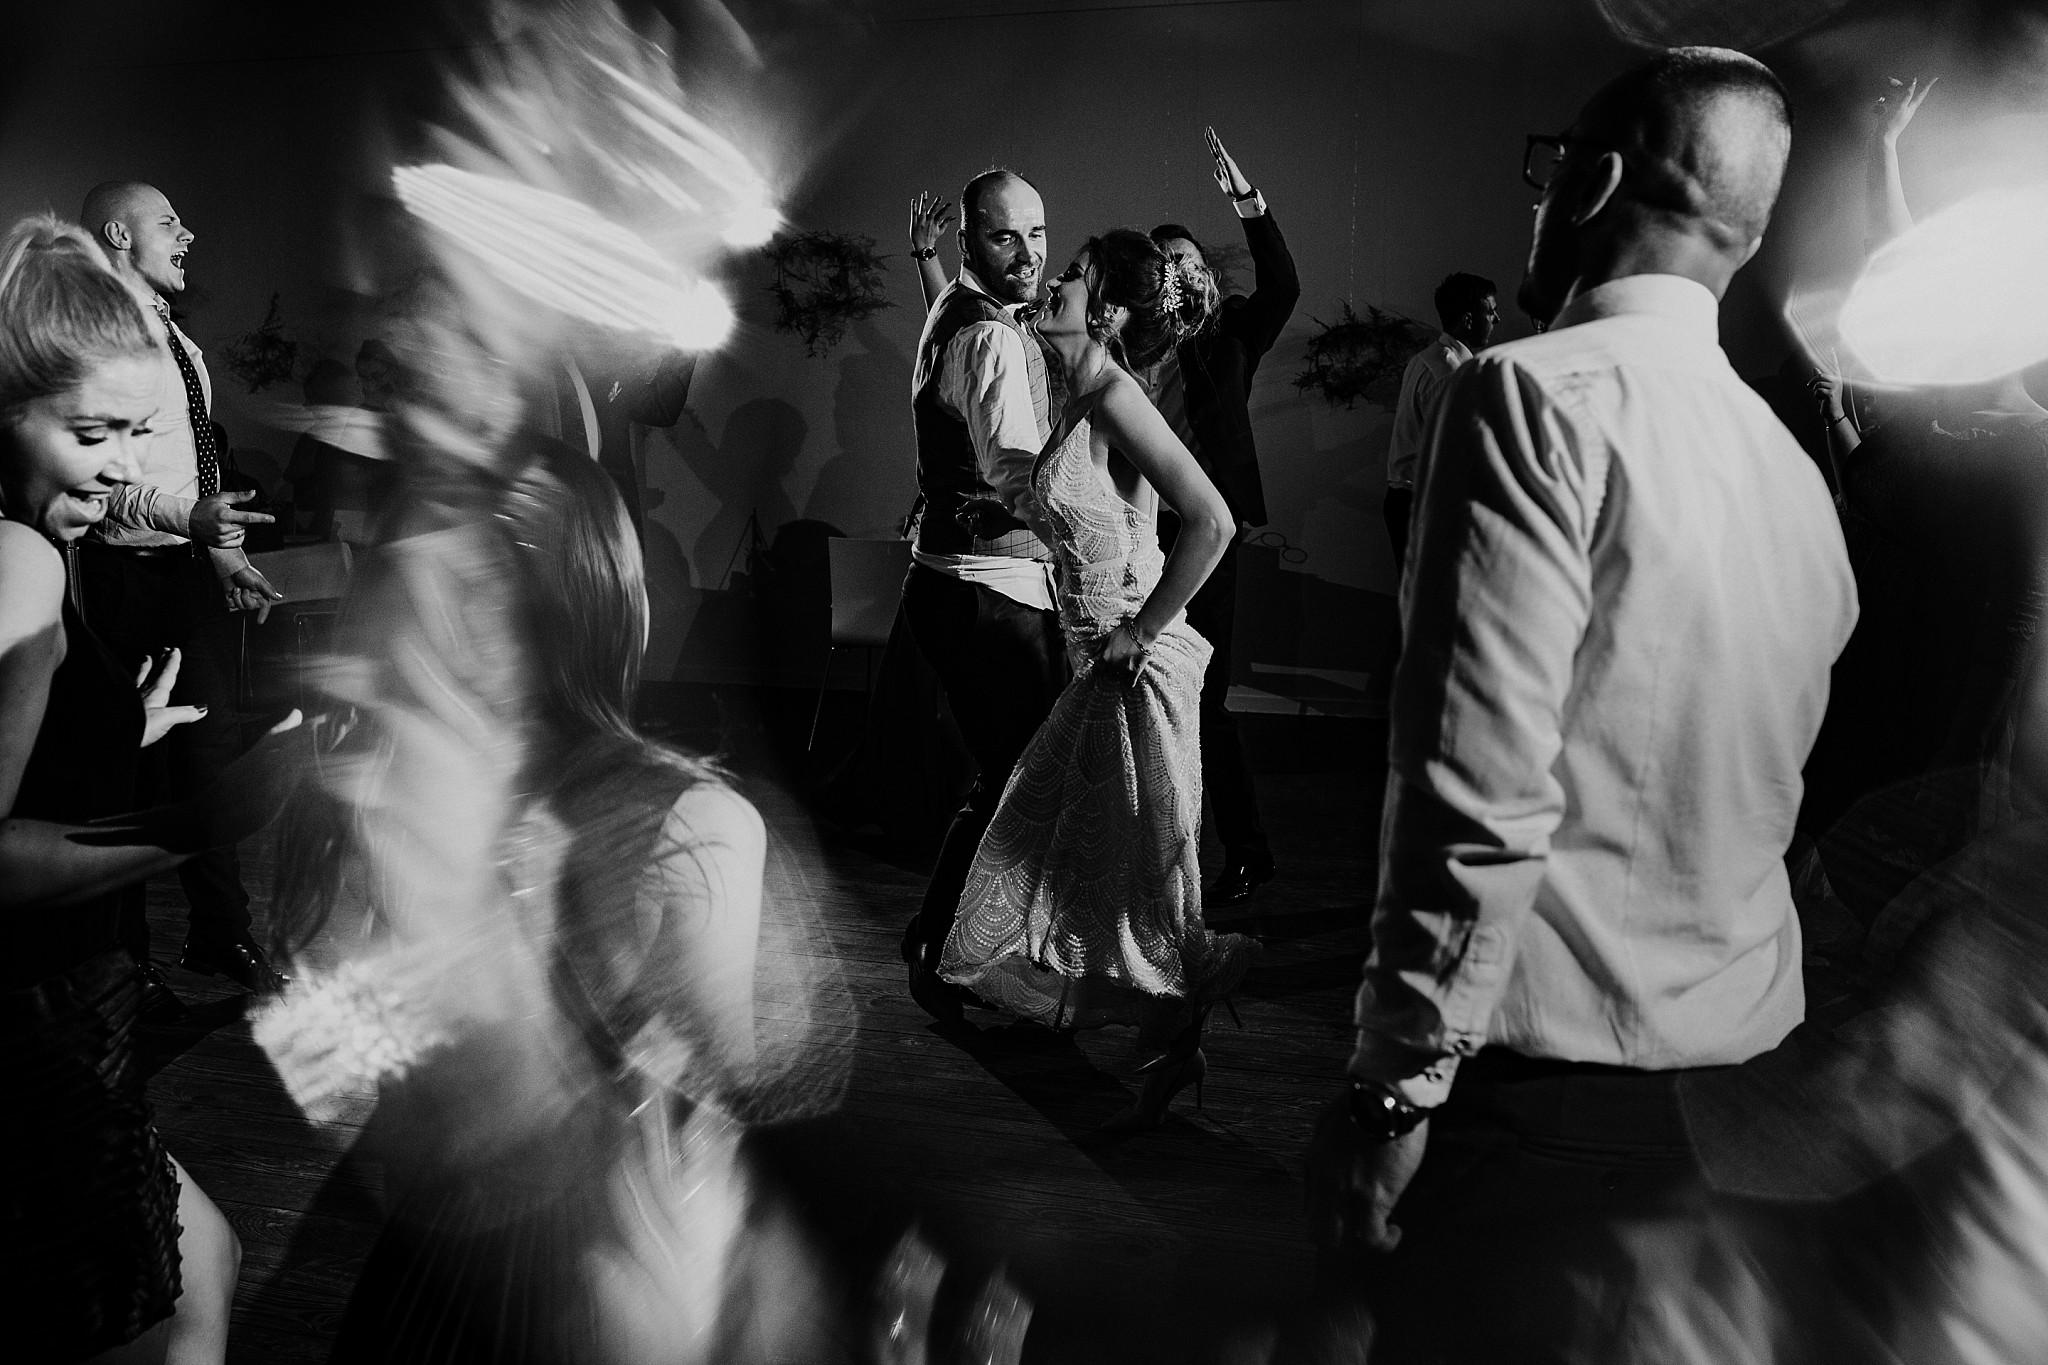 fotograf poznan wesele dobra truskawka piekne wesele pod poznaniem wesele w dobrej truskawce piekna para mloda slub marzen slub koronawirus slub listopad wesele koronawirus 430